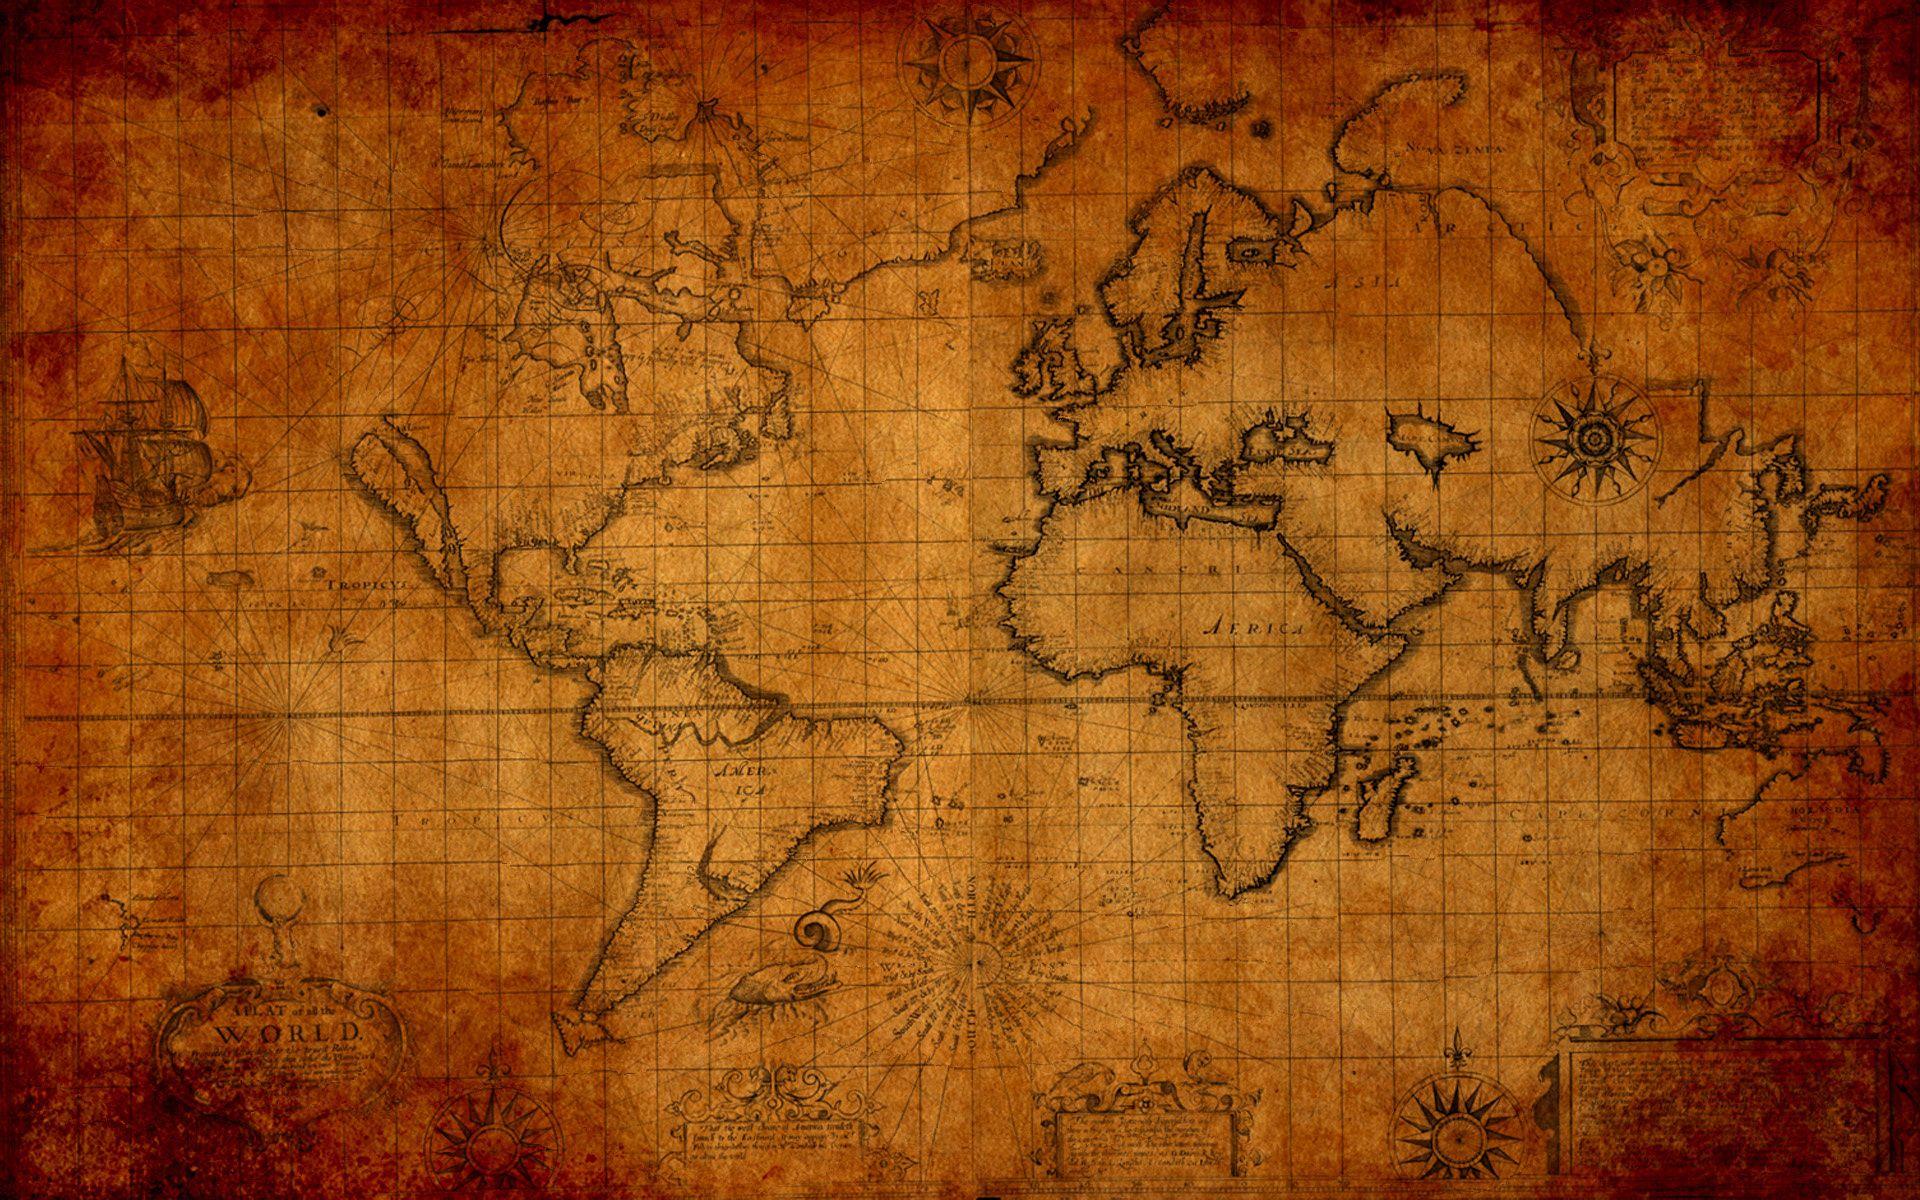 Pin by dash ko on map pinterest old world map digital art hd desktop wallpaper earth wallpaper map wallpaper digital art no gumiabroncs Image collections